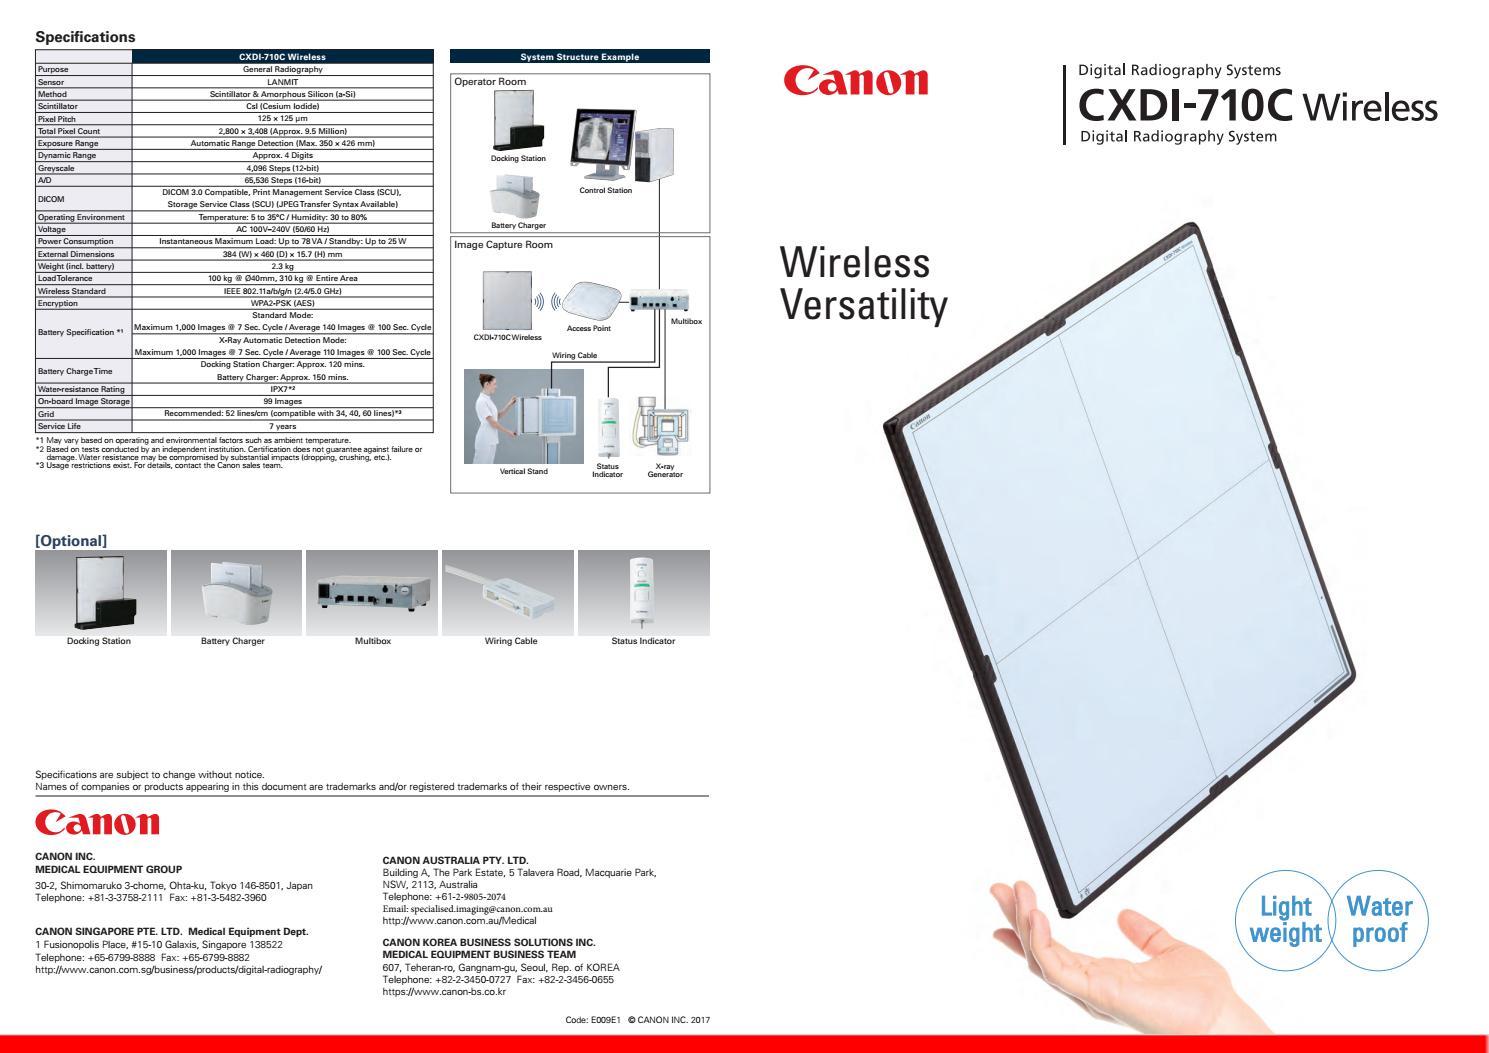 Brochure aus170522 cxdi 710c wireless en v1 au revision sm by DLC